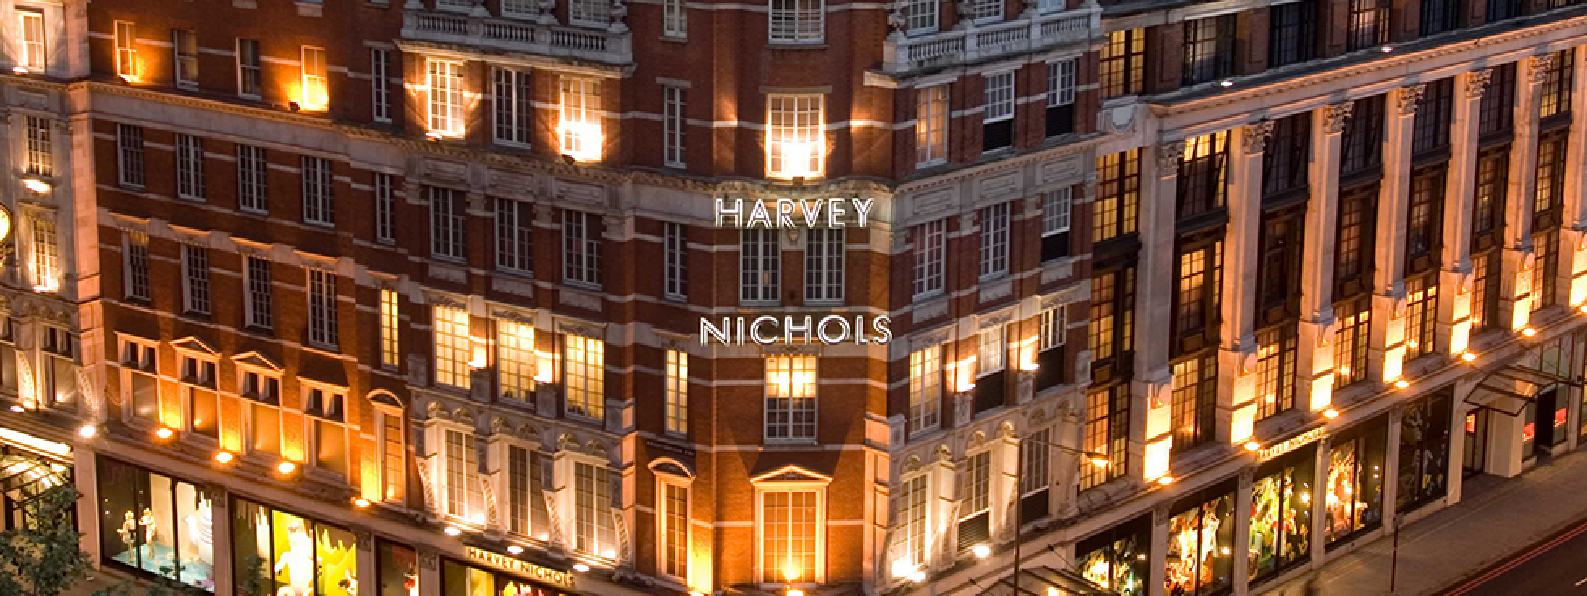 Harvey Nicholas